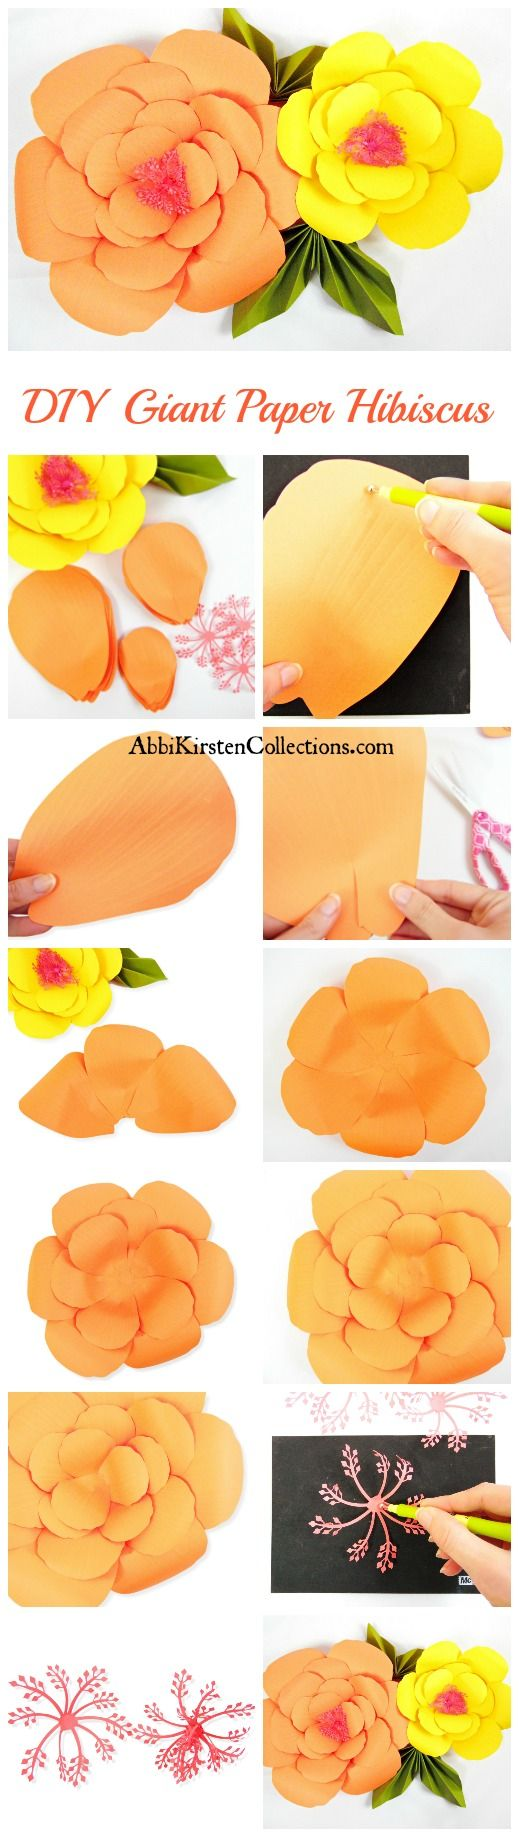 Hibiscus giant paper flower tutorial izmirmasajfo